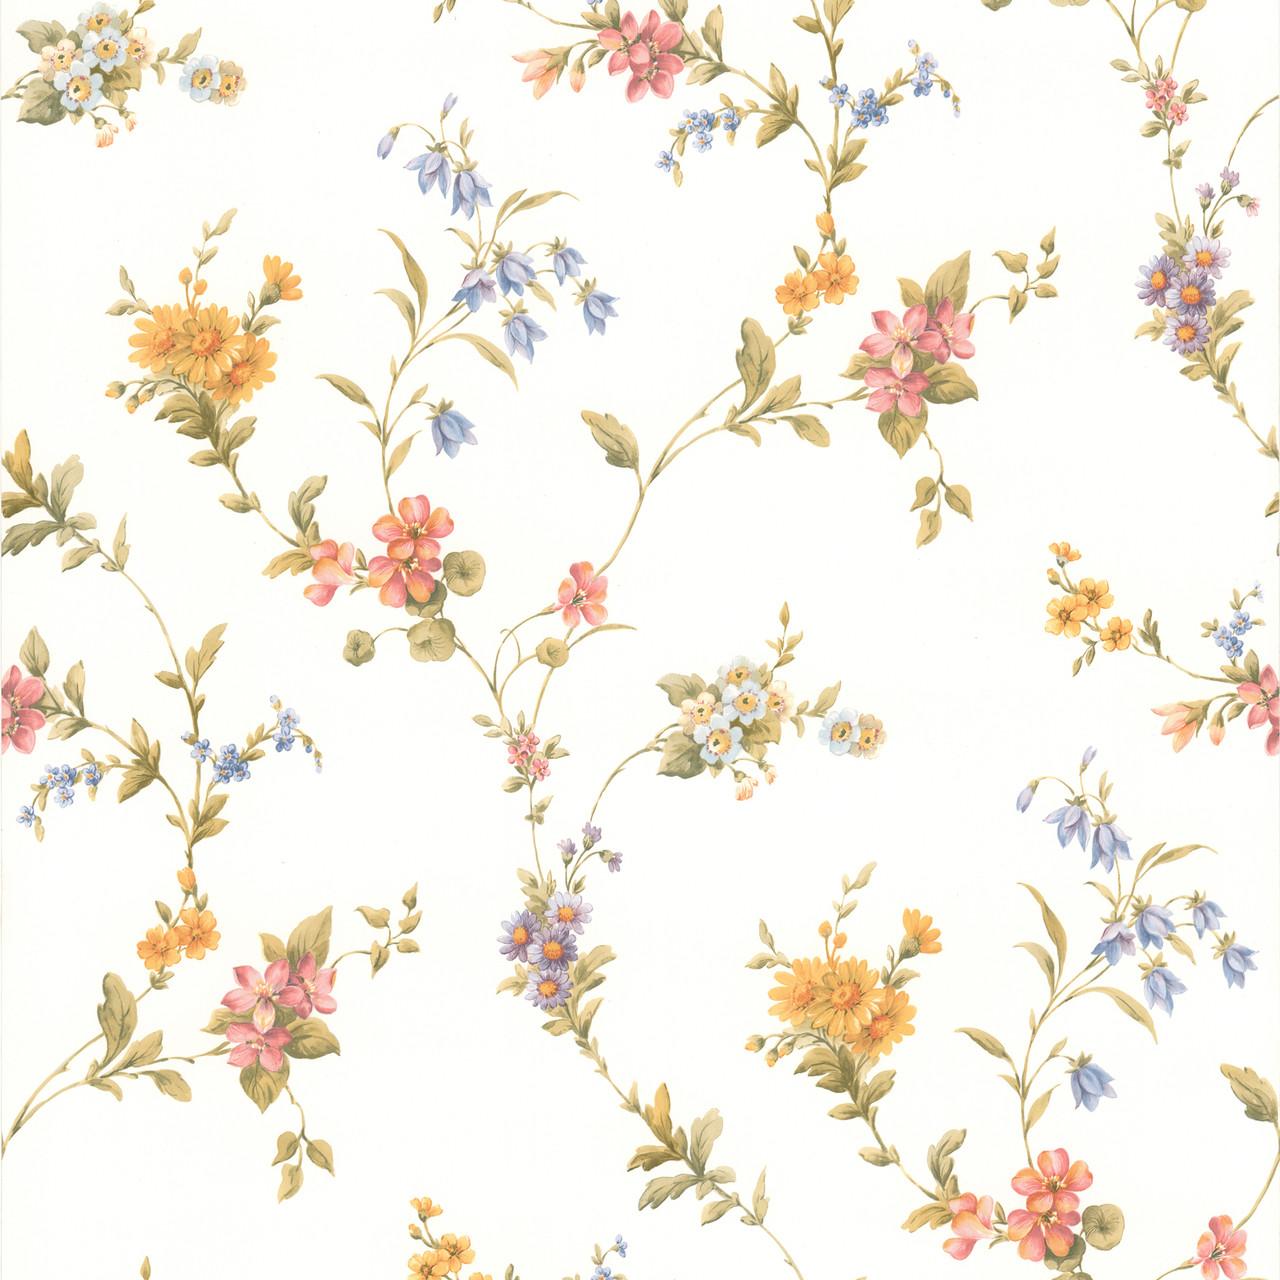 436 65757 Heidi Peach Floral Trail Wallpaper Indoorwallpaper Com